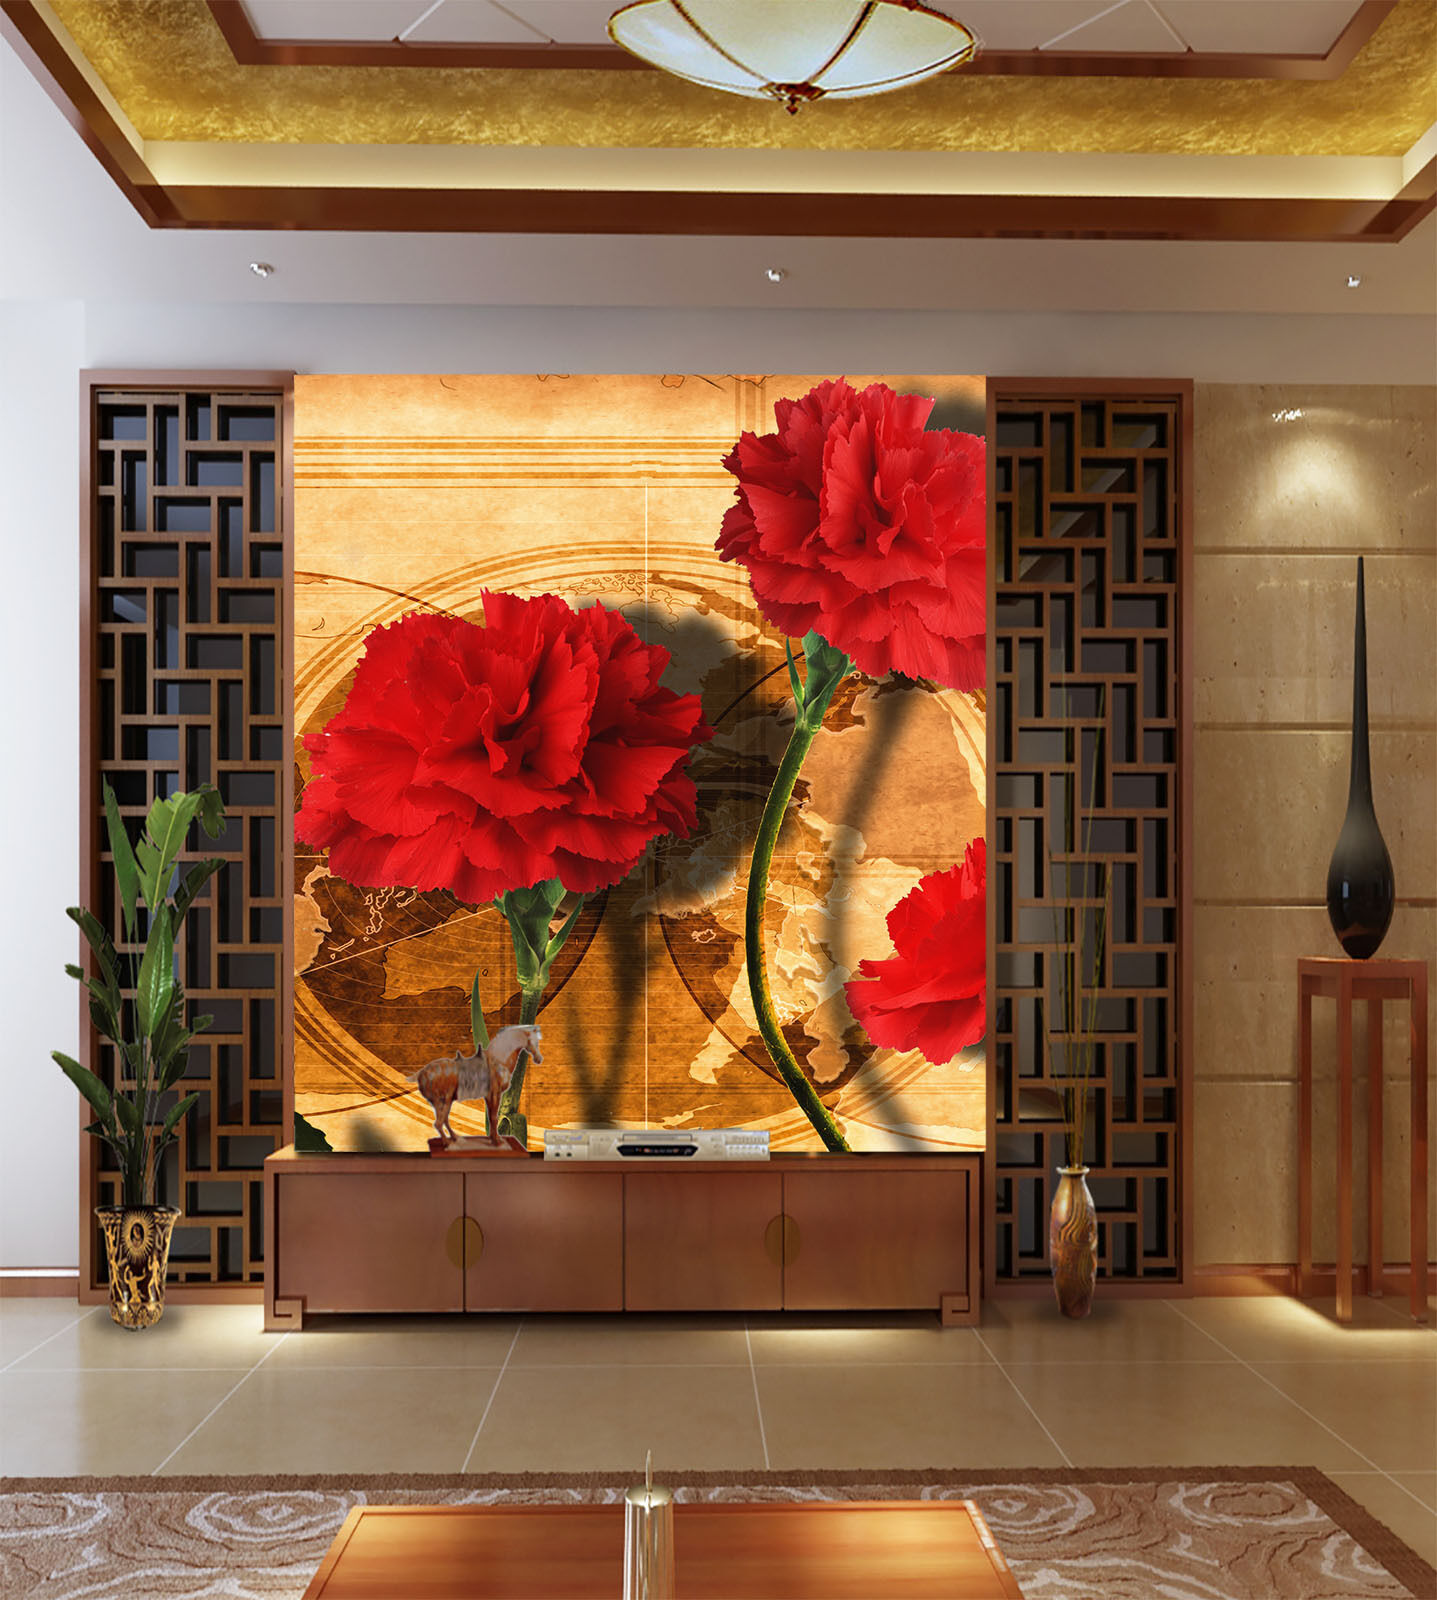 3D Leuchtend rede bluemen 1201 Fototapeten Wandbild Fototapete BildTapete Familie